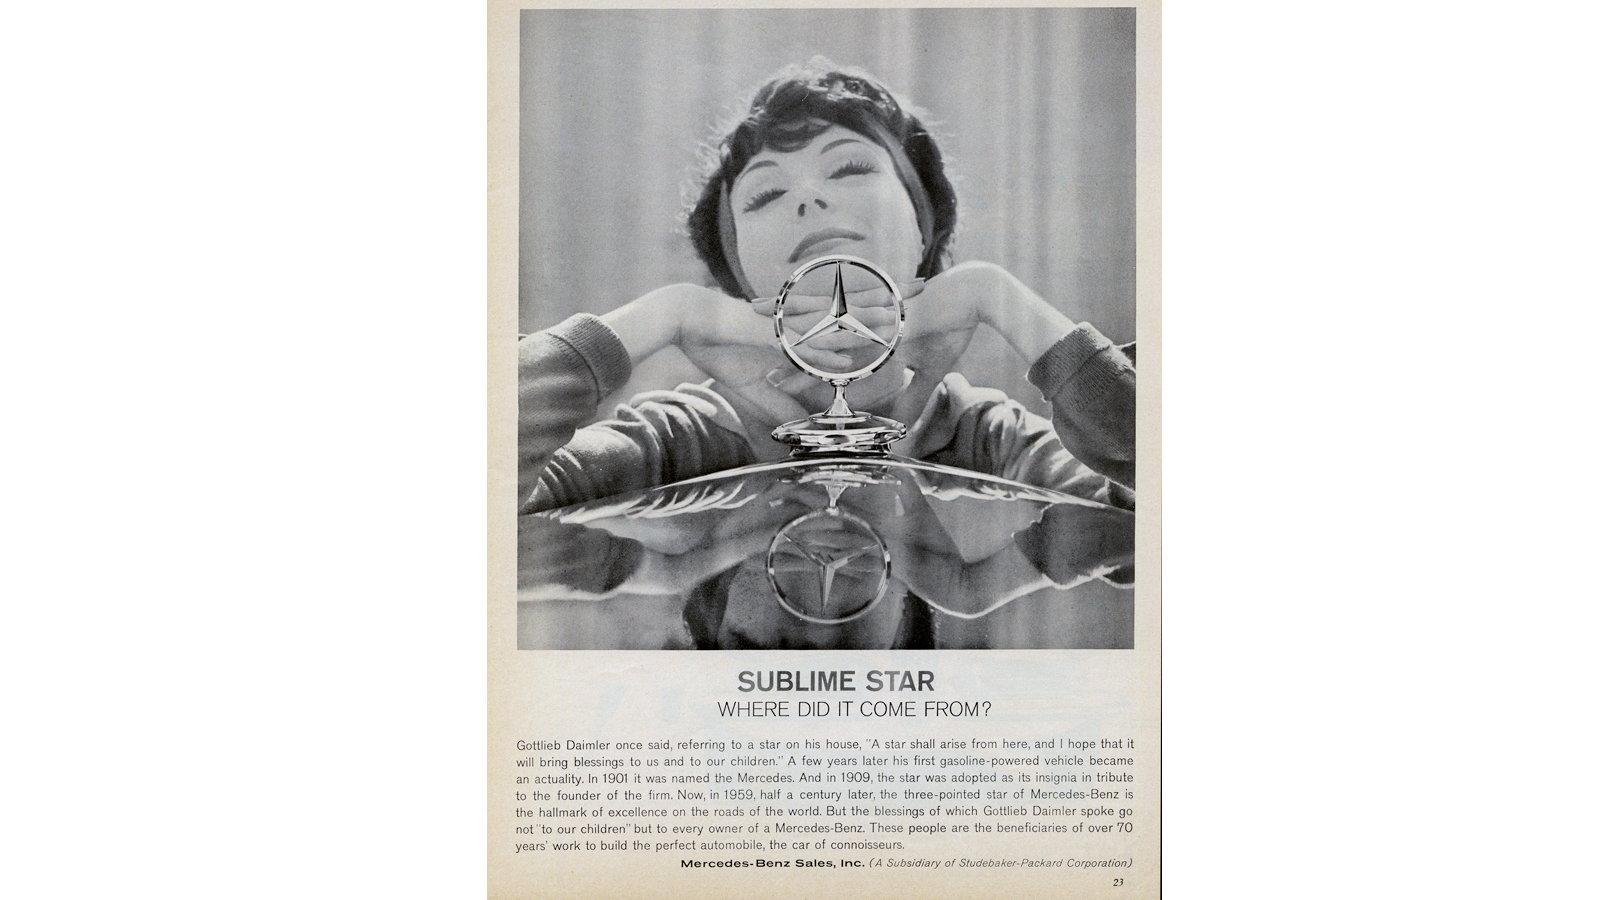 Sublime Star